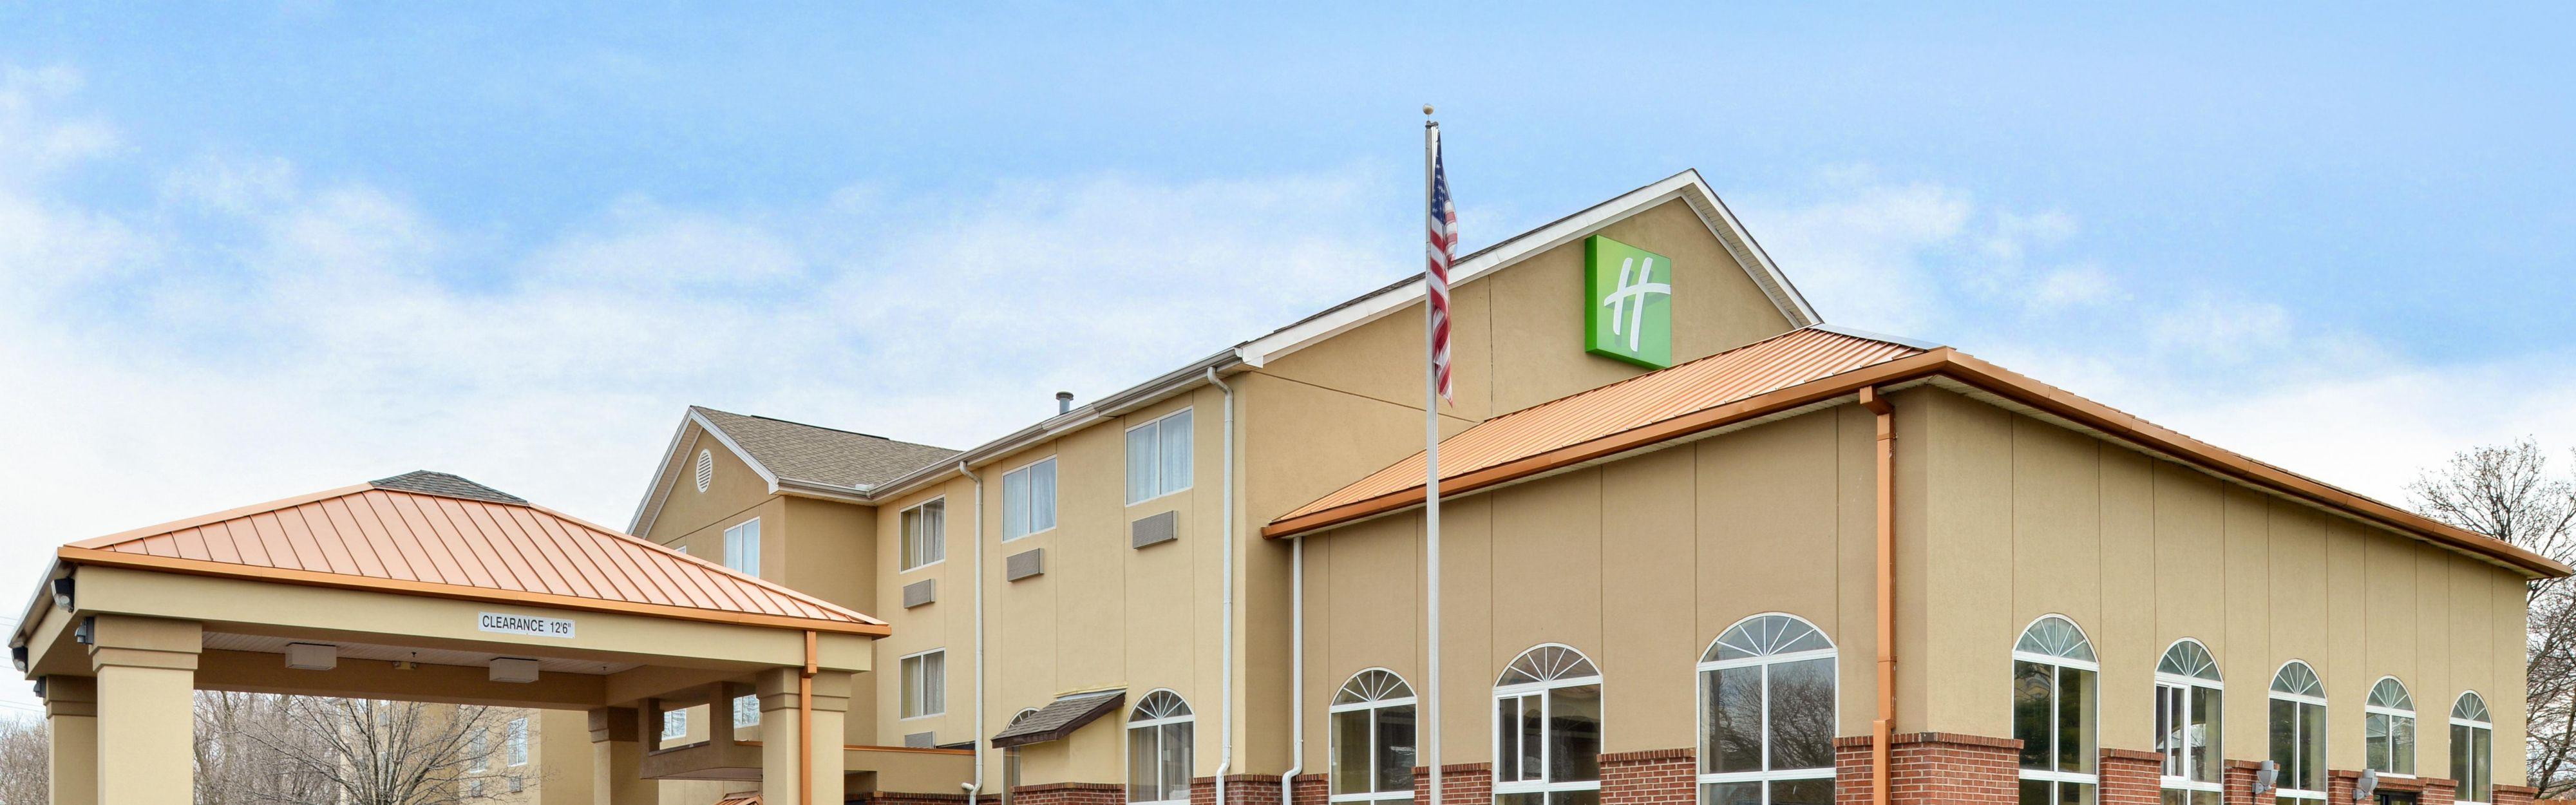 Holiday Inn Express Cincinnati-N/Sharonville image 0